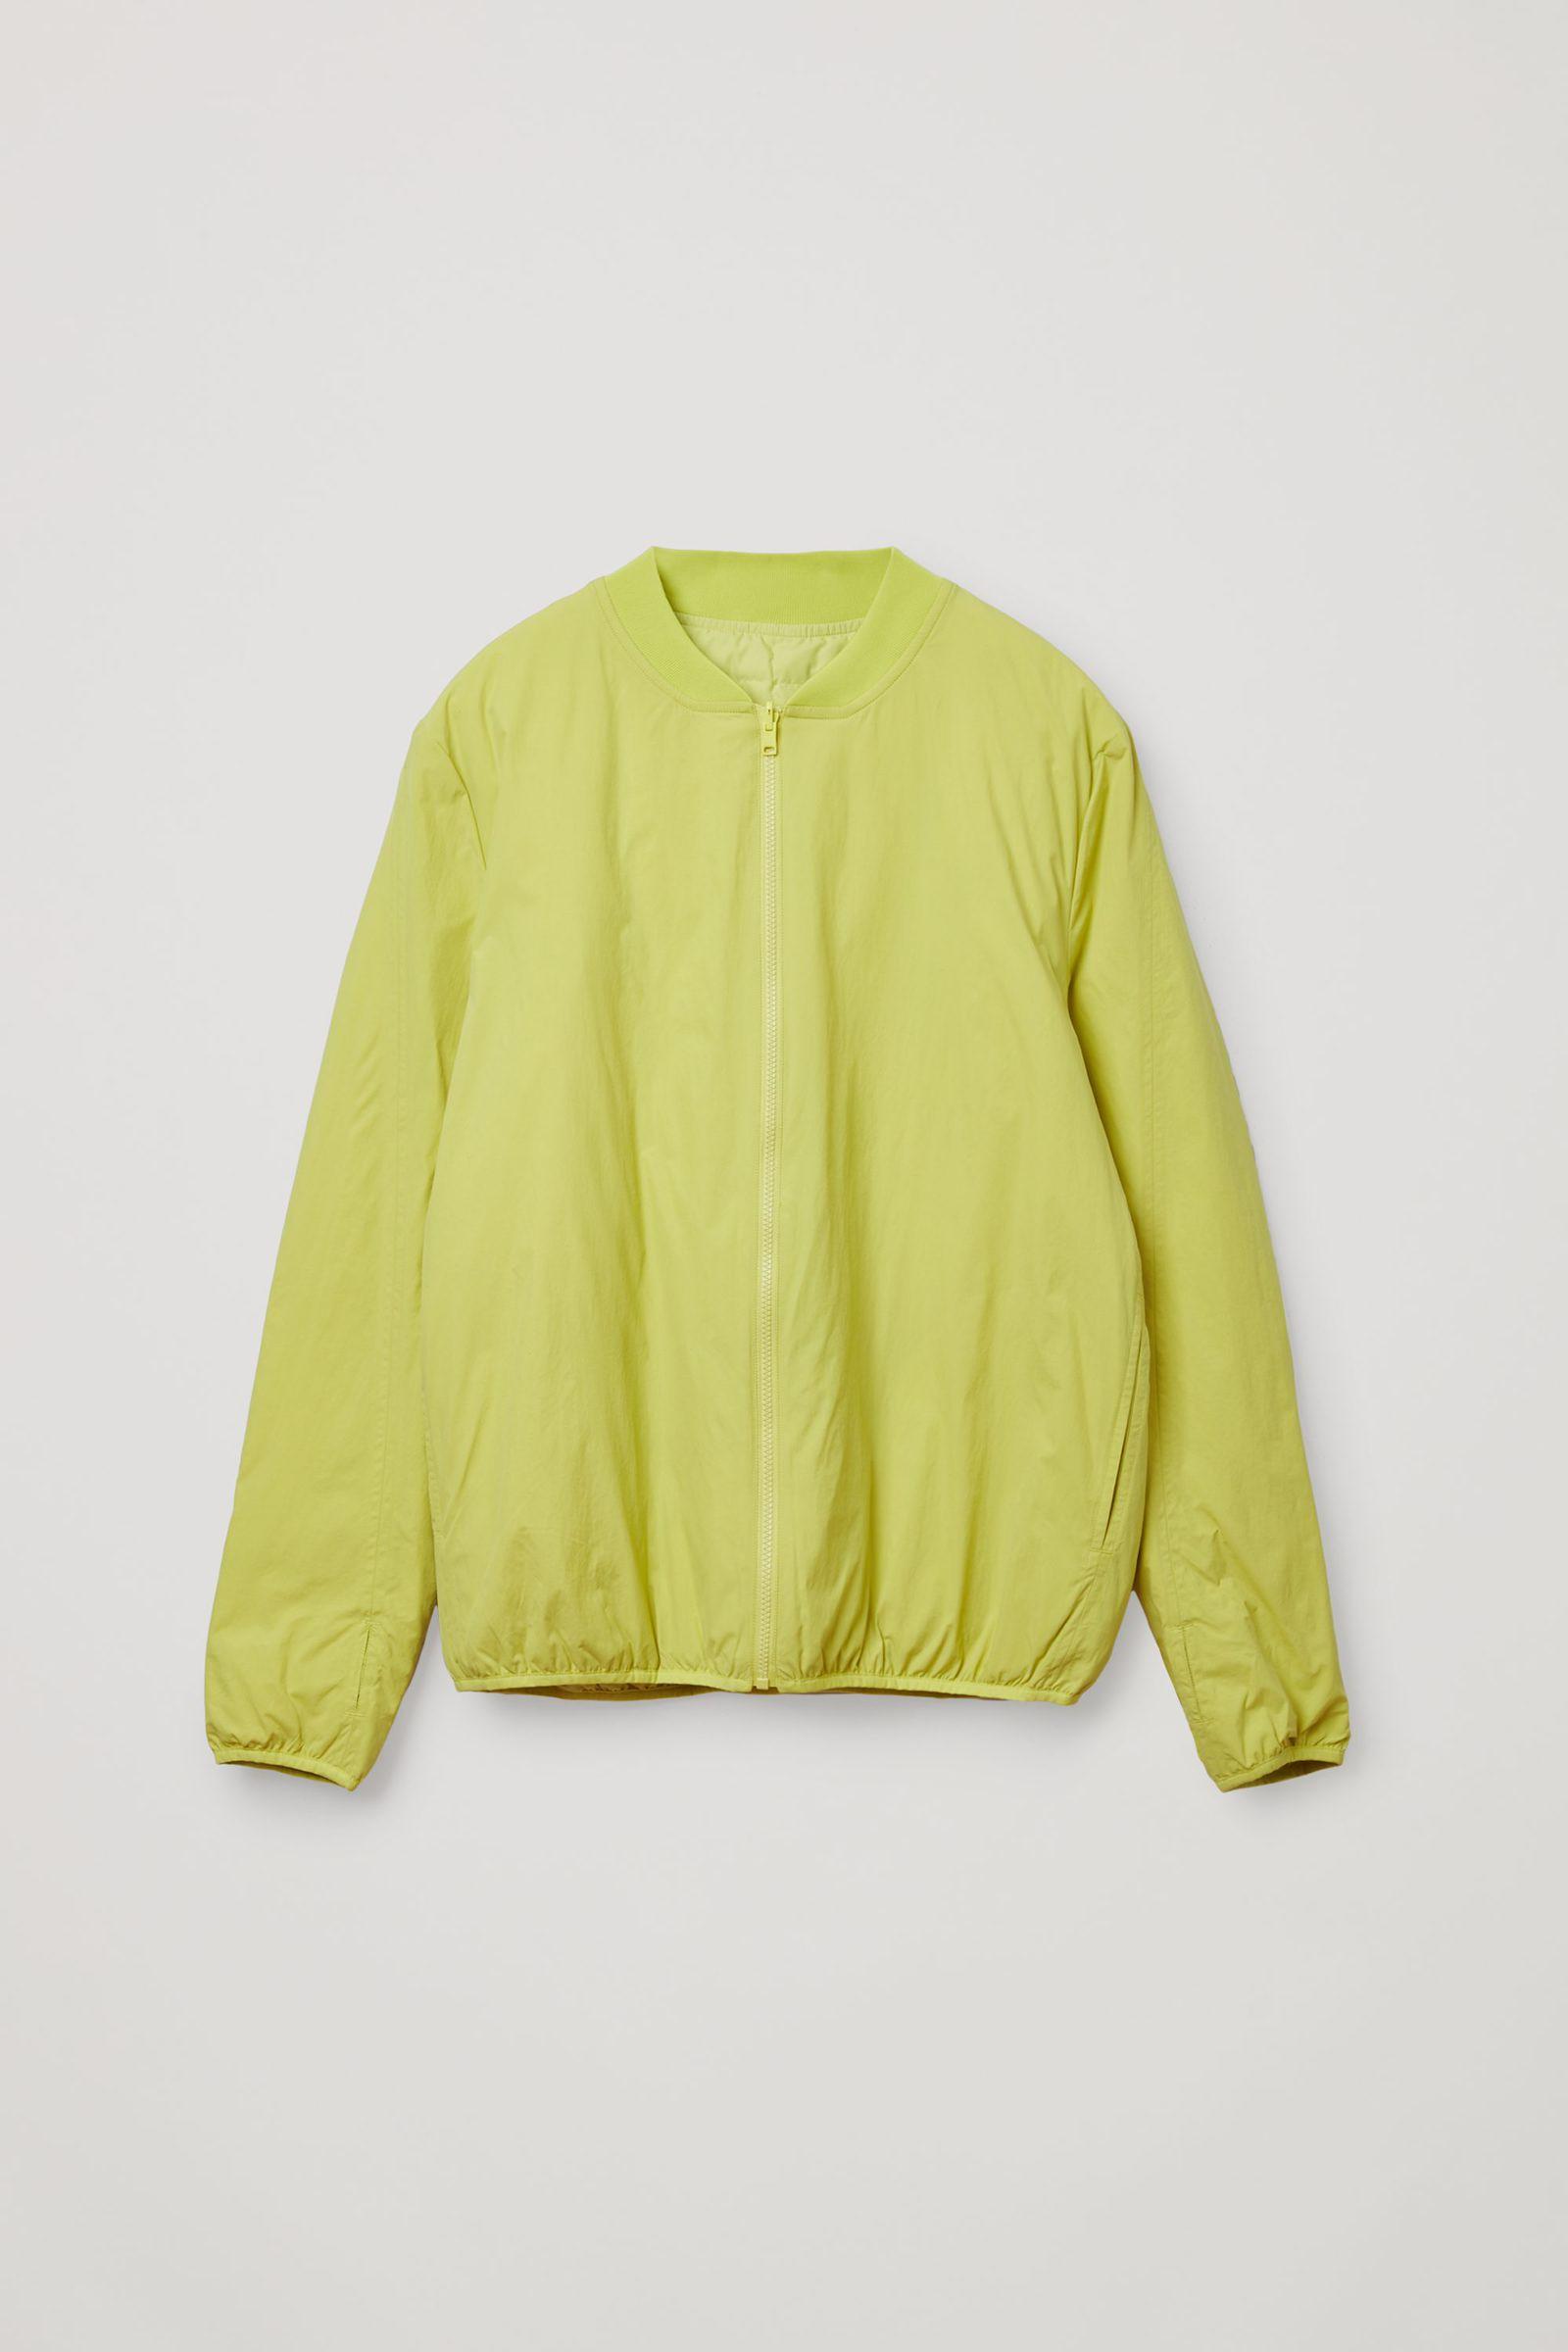 COS 리사이클 패딩 집업 봄버 재킷의 옐로우컬러 Product입니다.